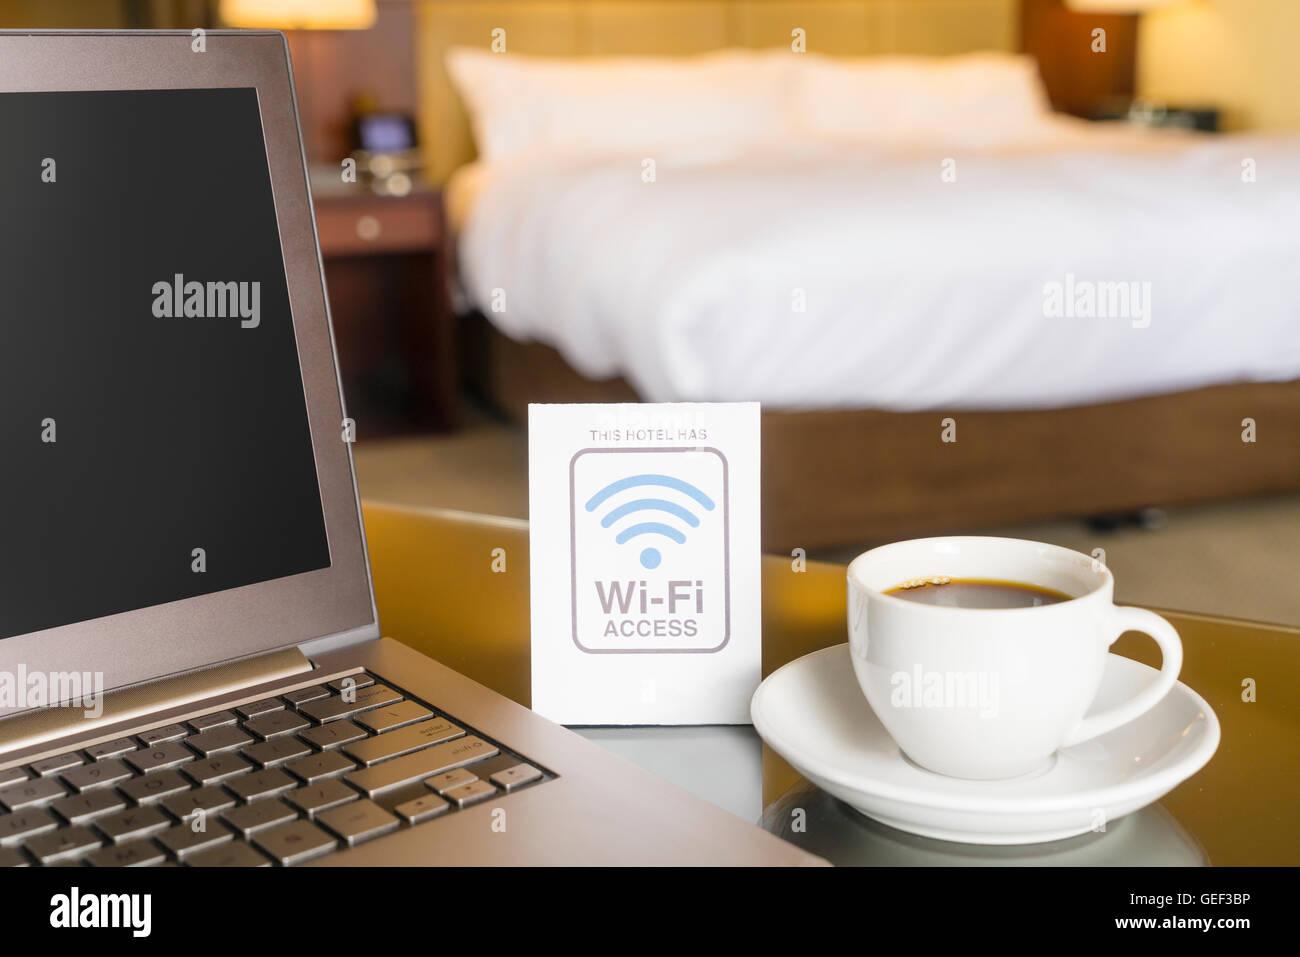 Habitación de hotel con acceso wifi firmar Imagen De Stock